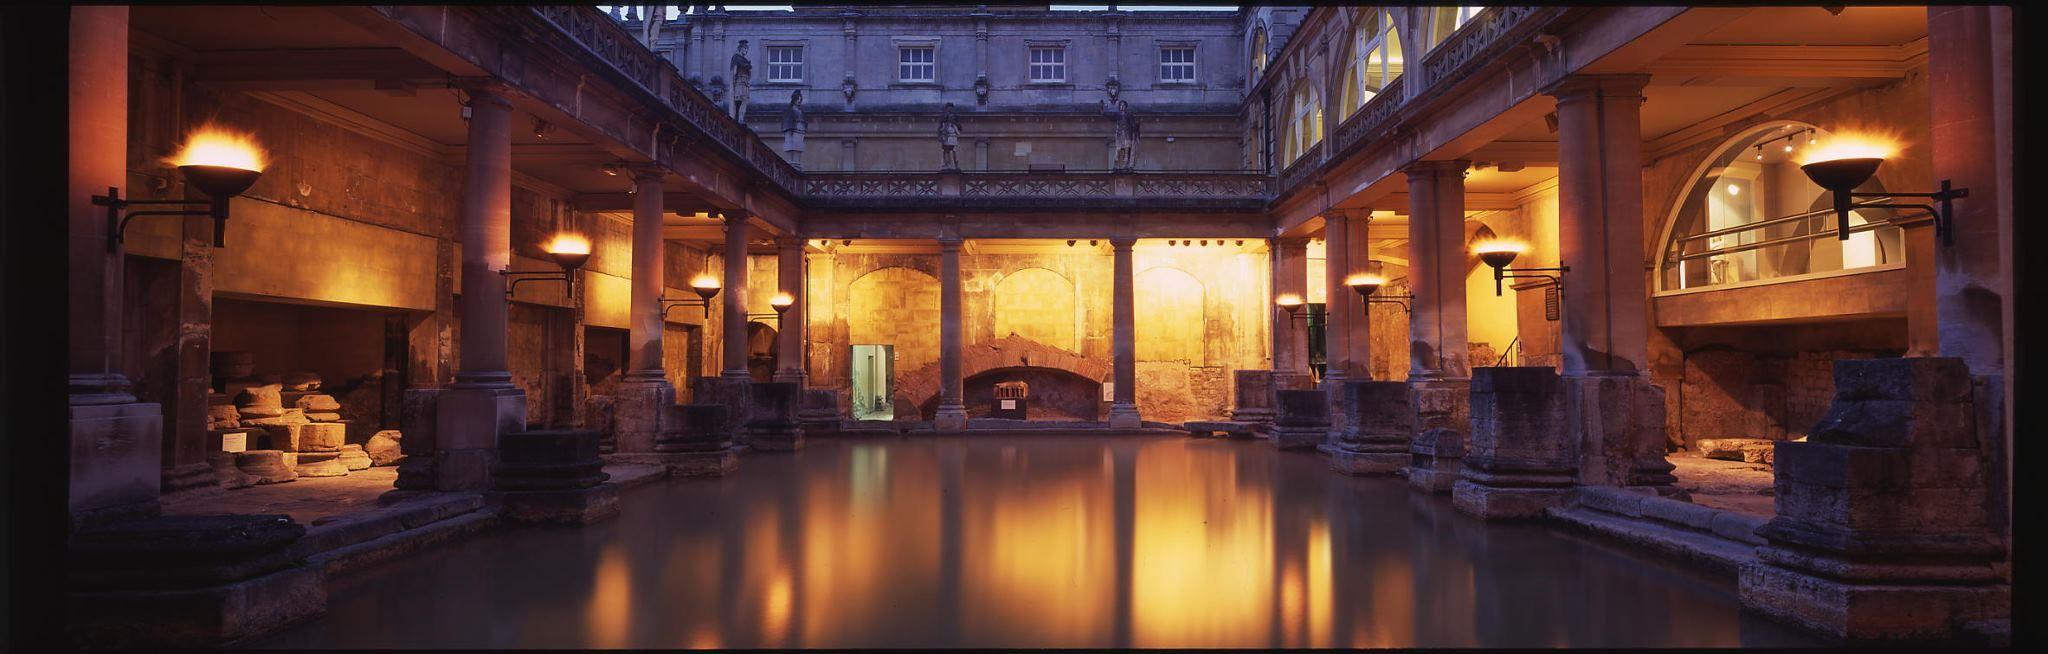 Roman Baths At Bath In The Evening Roman Baths Romantic Places